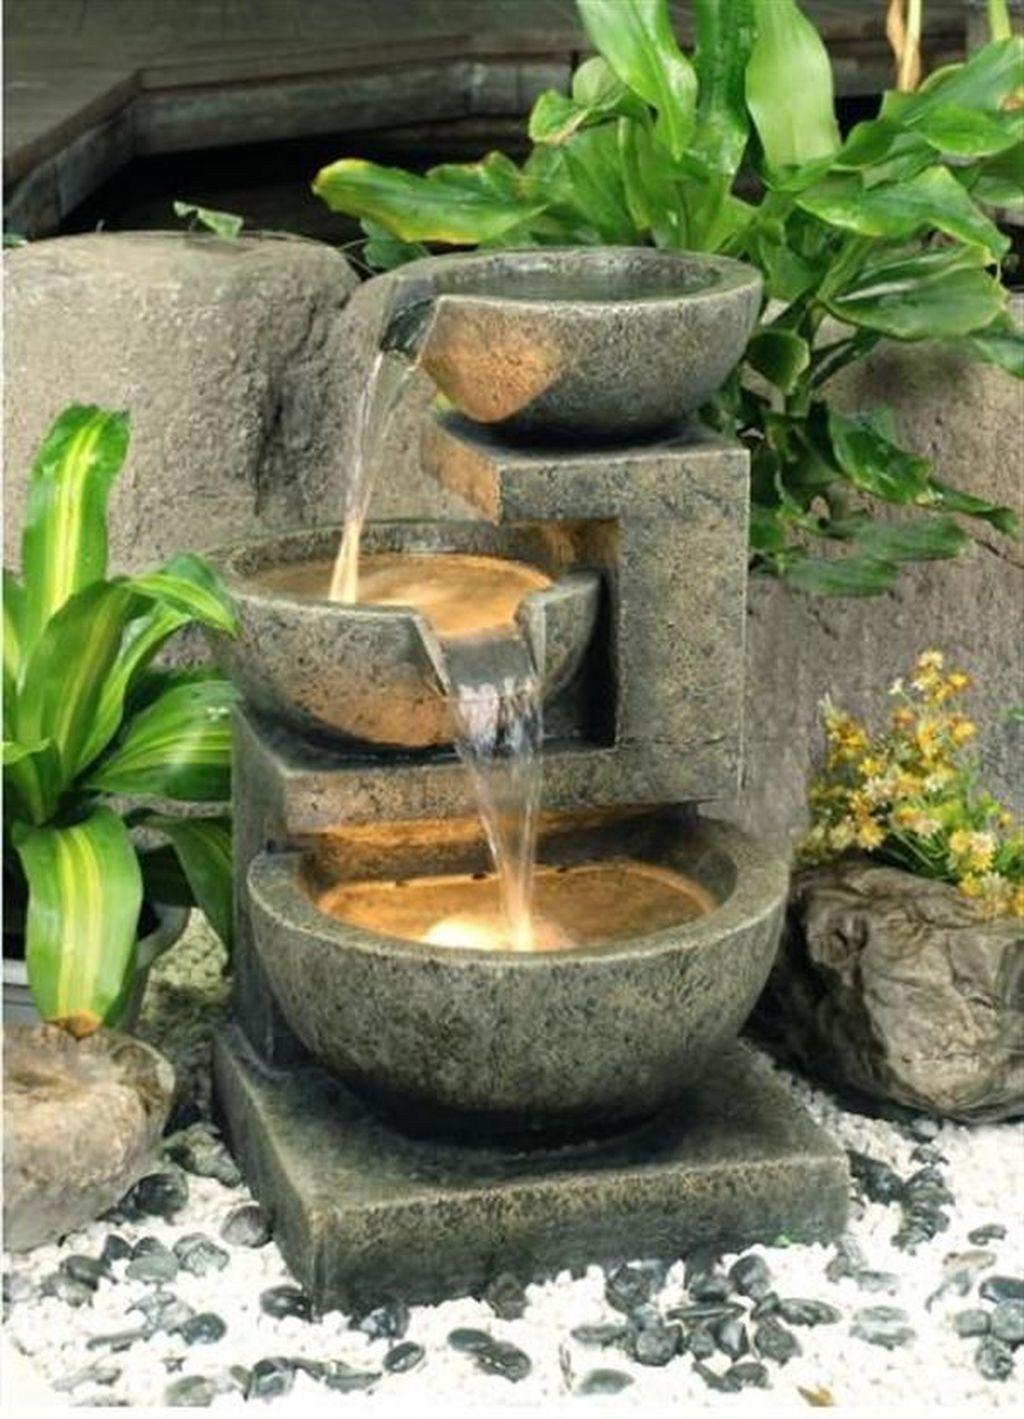 48 Stunning Outdoor Water Fountains Ideas Best For Garden Landscaping Trendehouse Peyzaj Kucuk Bahceler Bahce Su Cesmeleri Modern outdoor water fountain